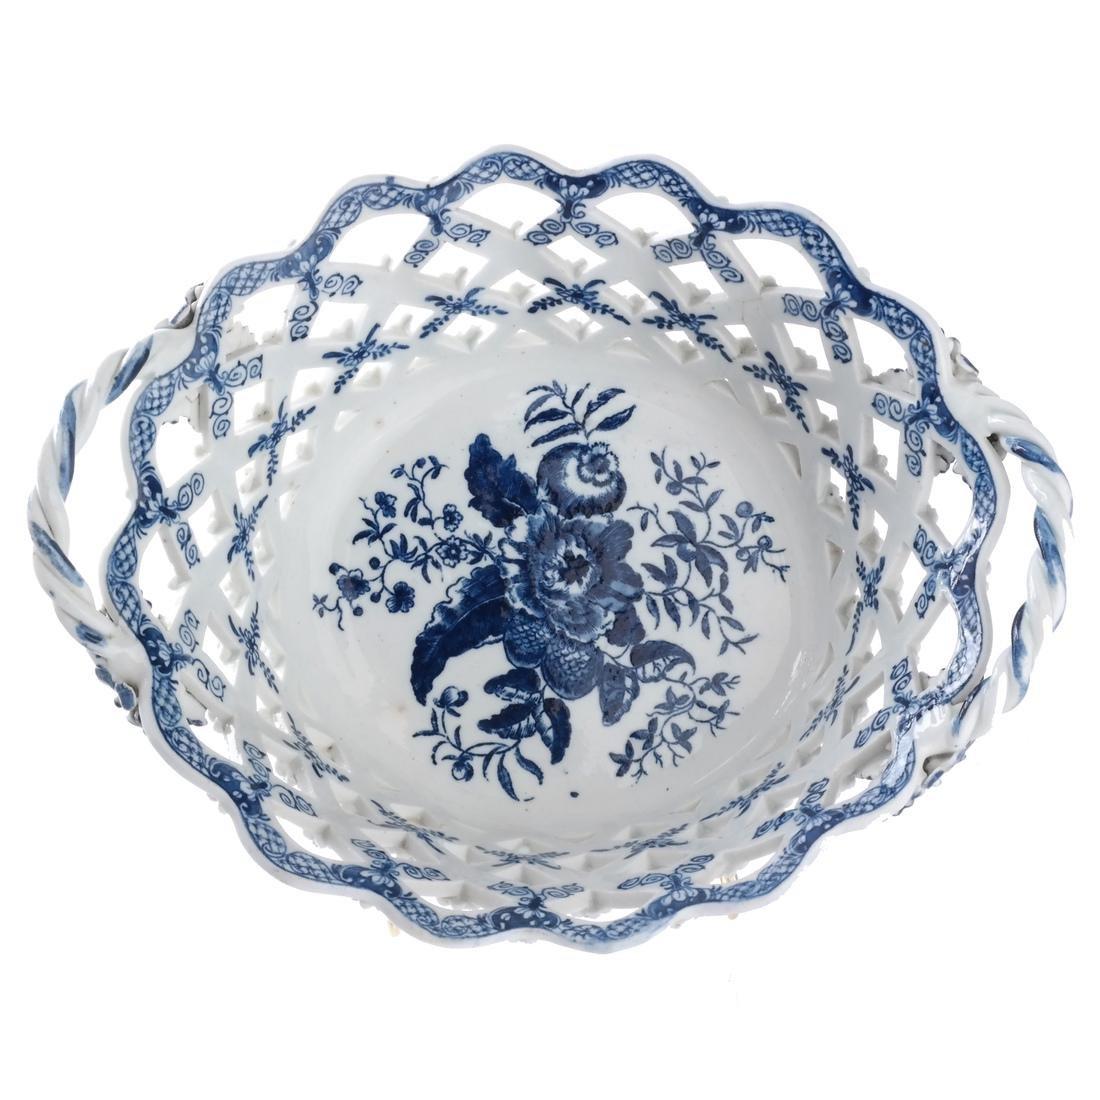 Two 18th C. English Porcelain Baskets - 2